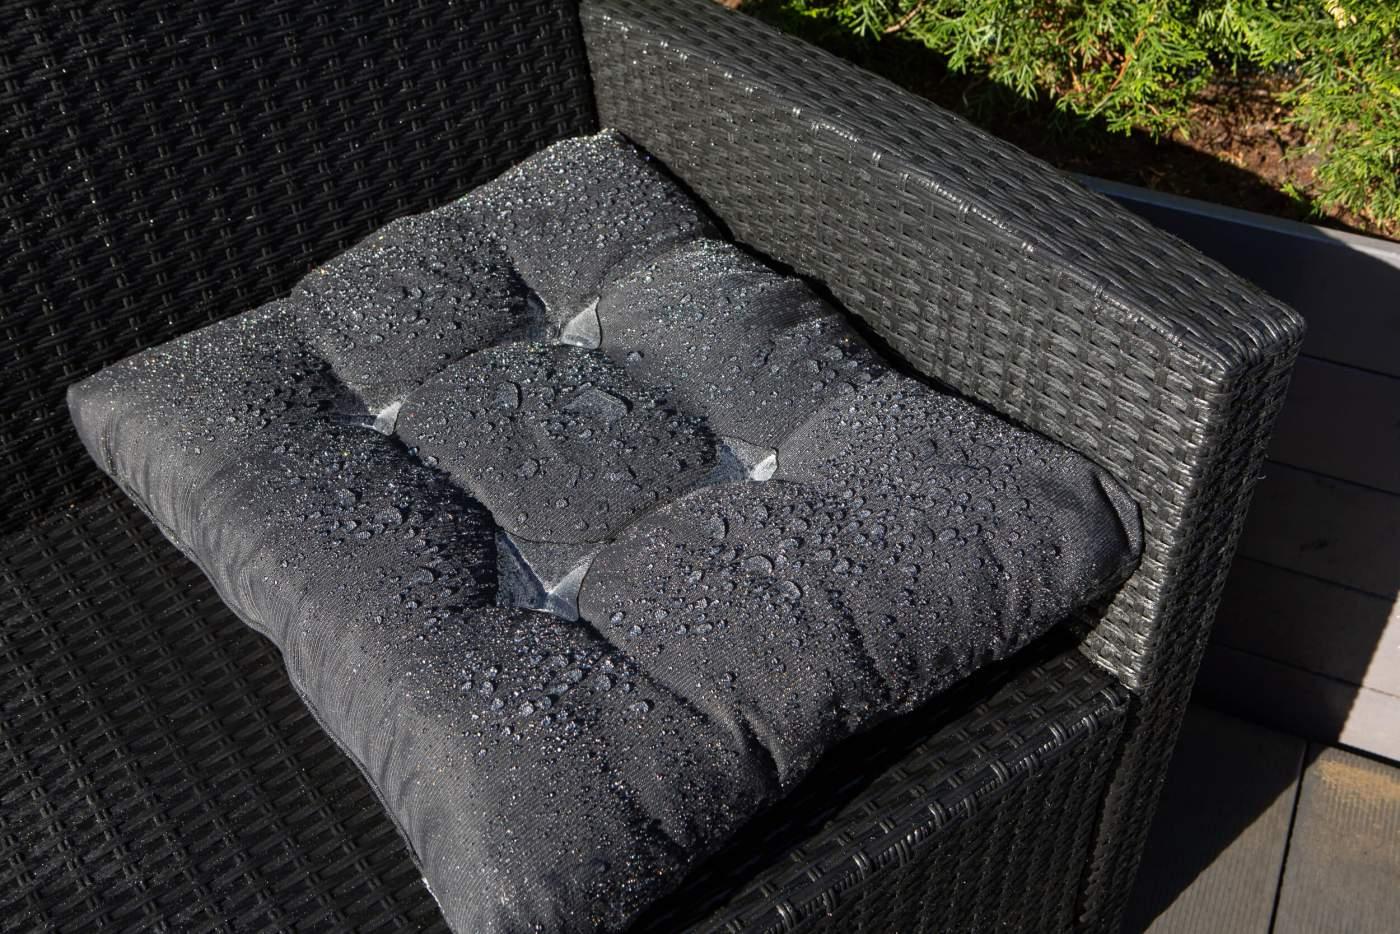 GoGoNano nano coating on garden furniture textile and leather